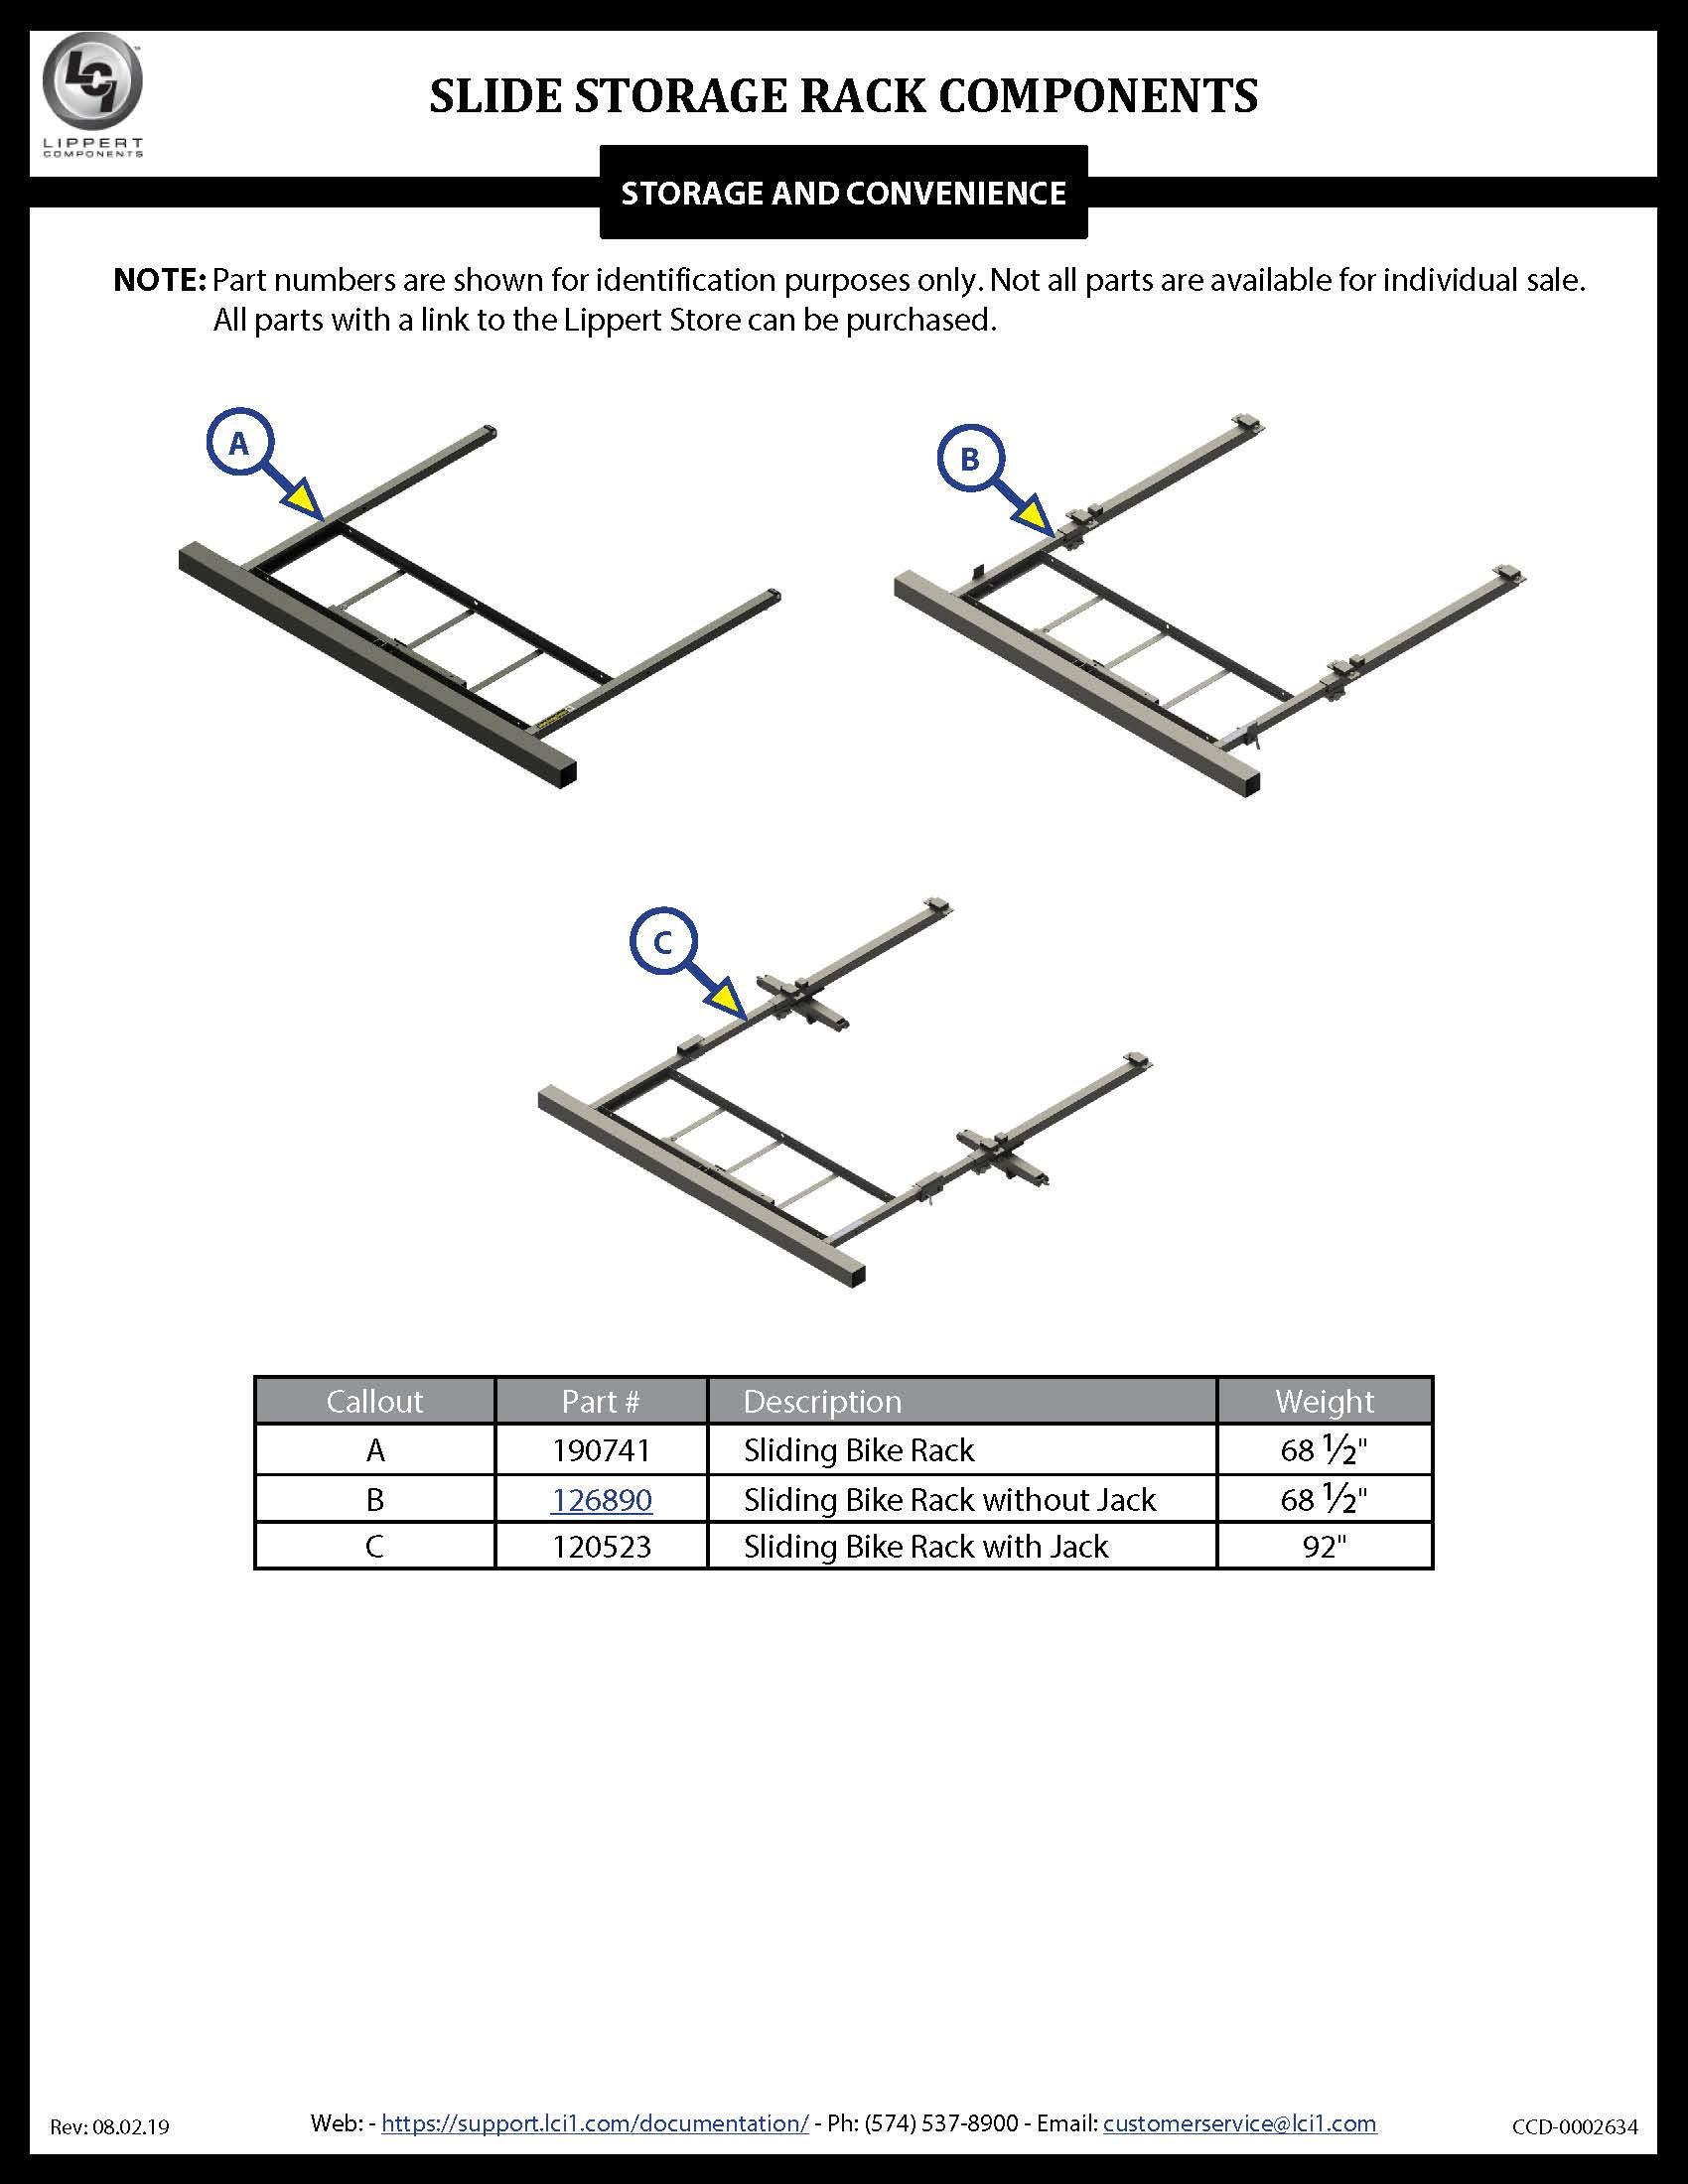 Slide Storage Racks Components